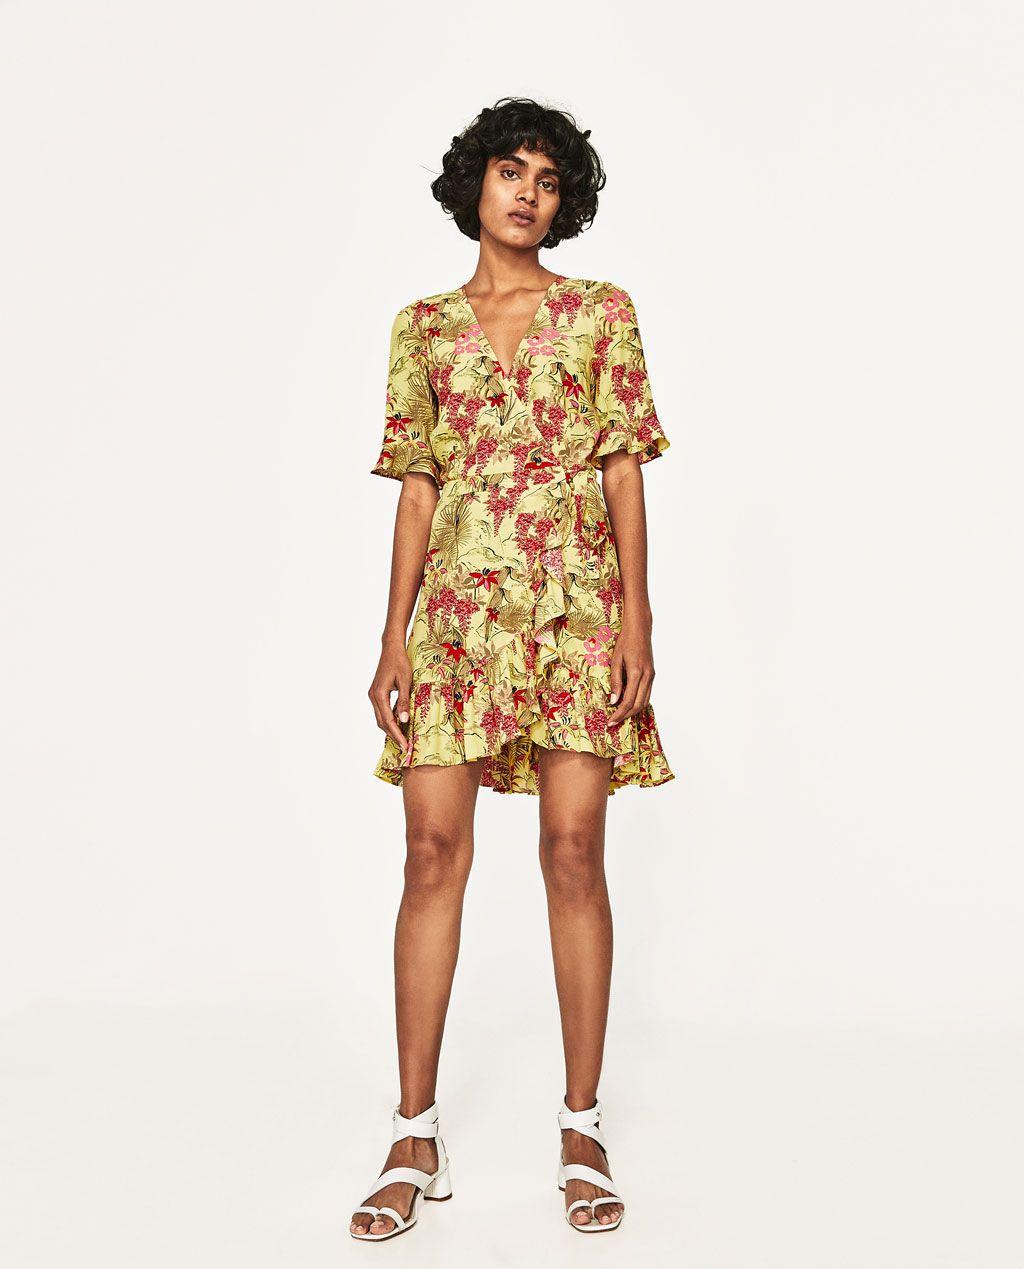 883e2377 FLORAL PRINT DRESS-DRESSES-SALE-WOMAN   ZARA United States   Cuts ...